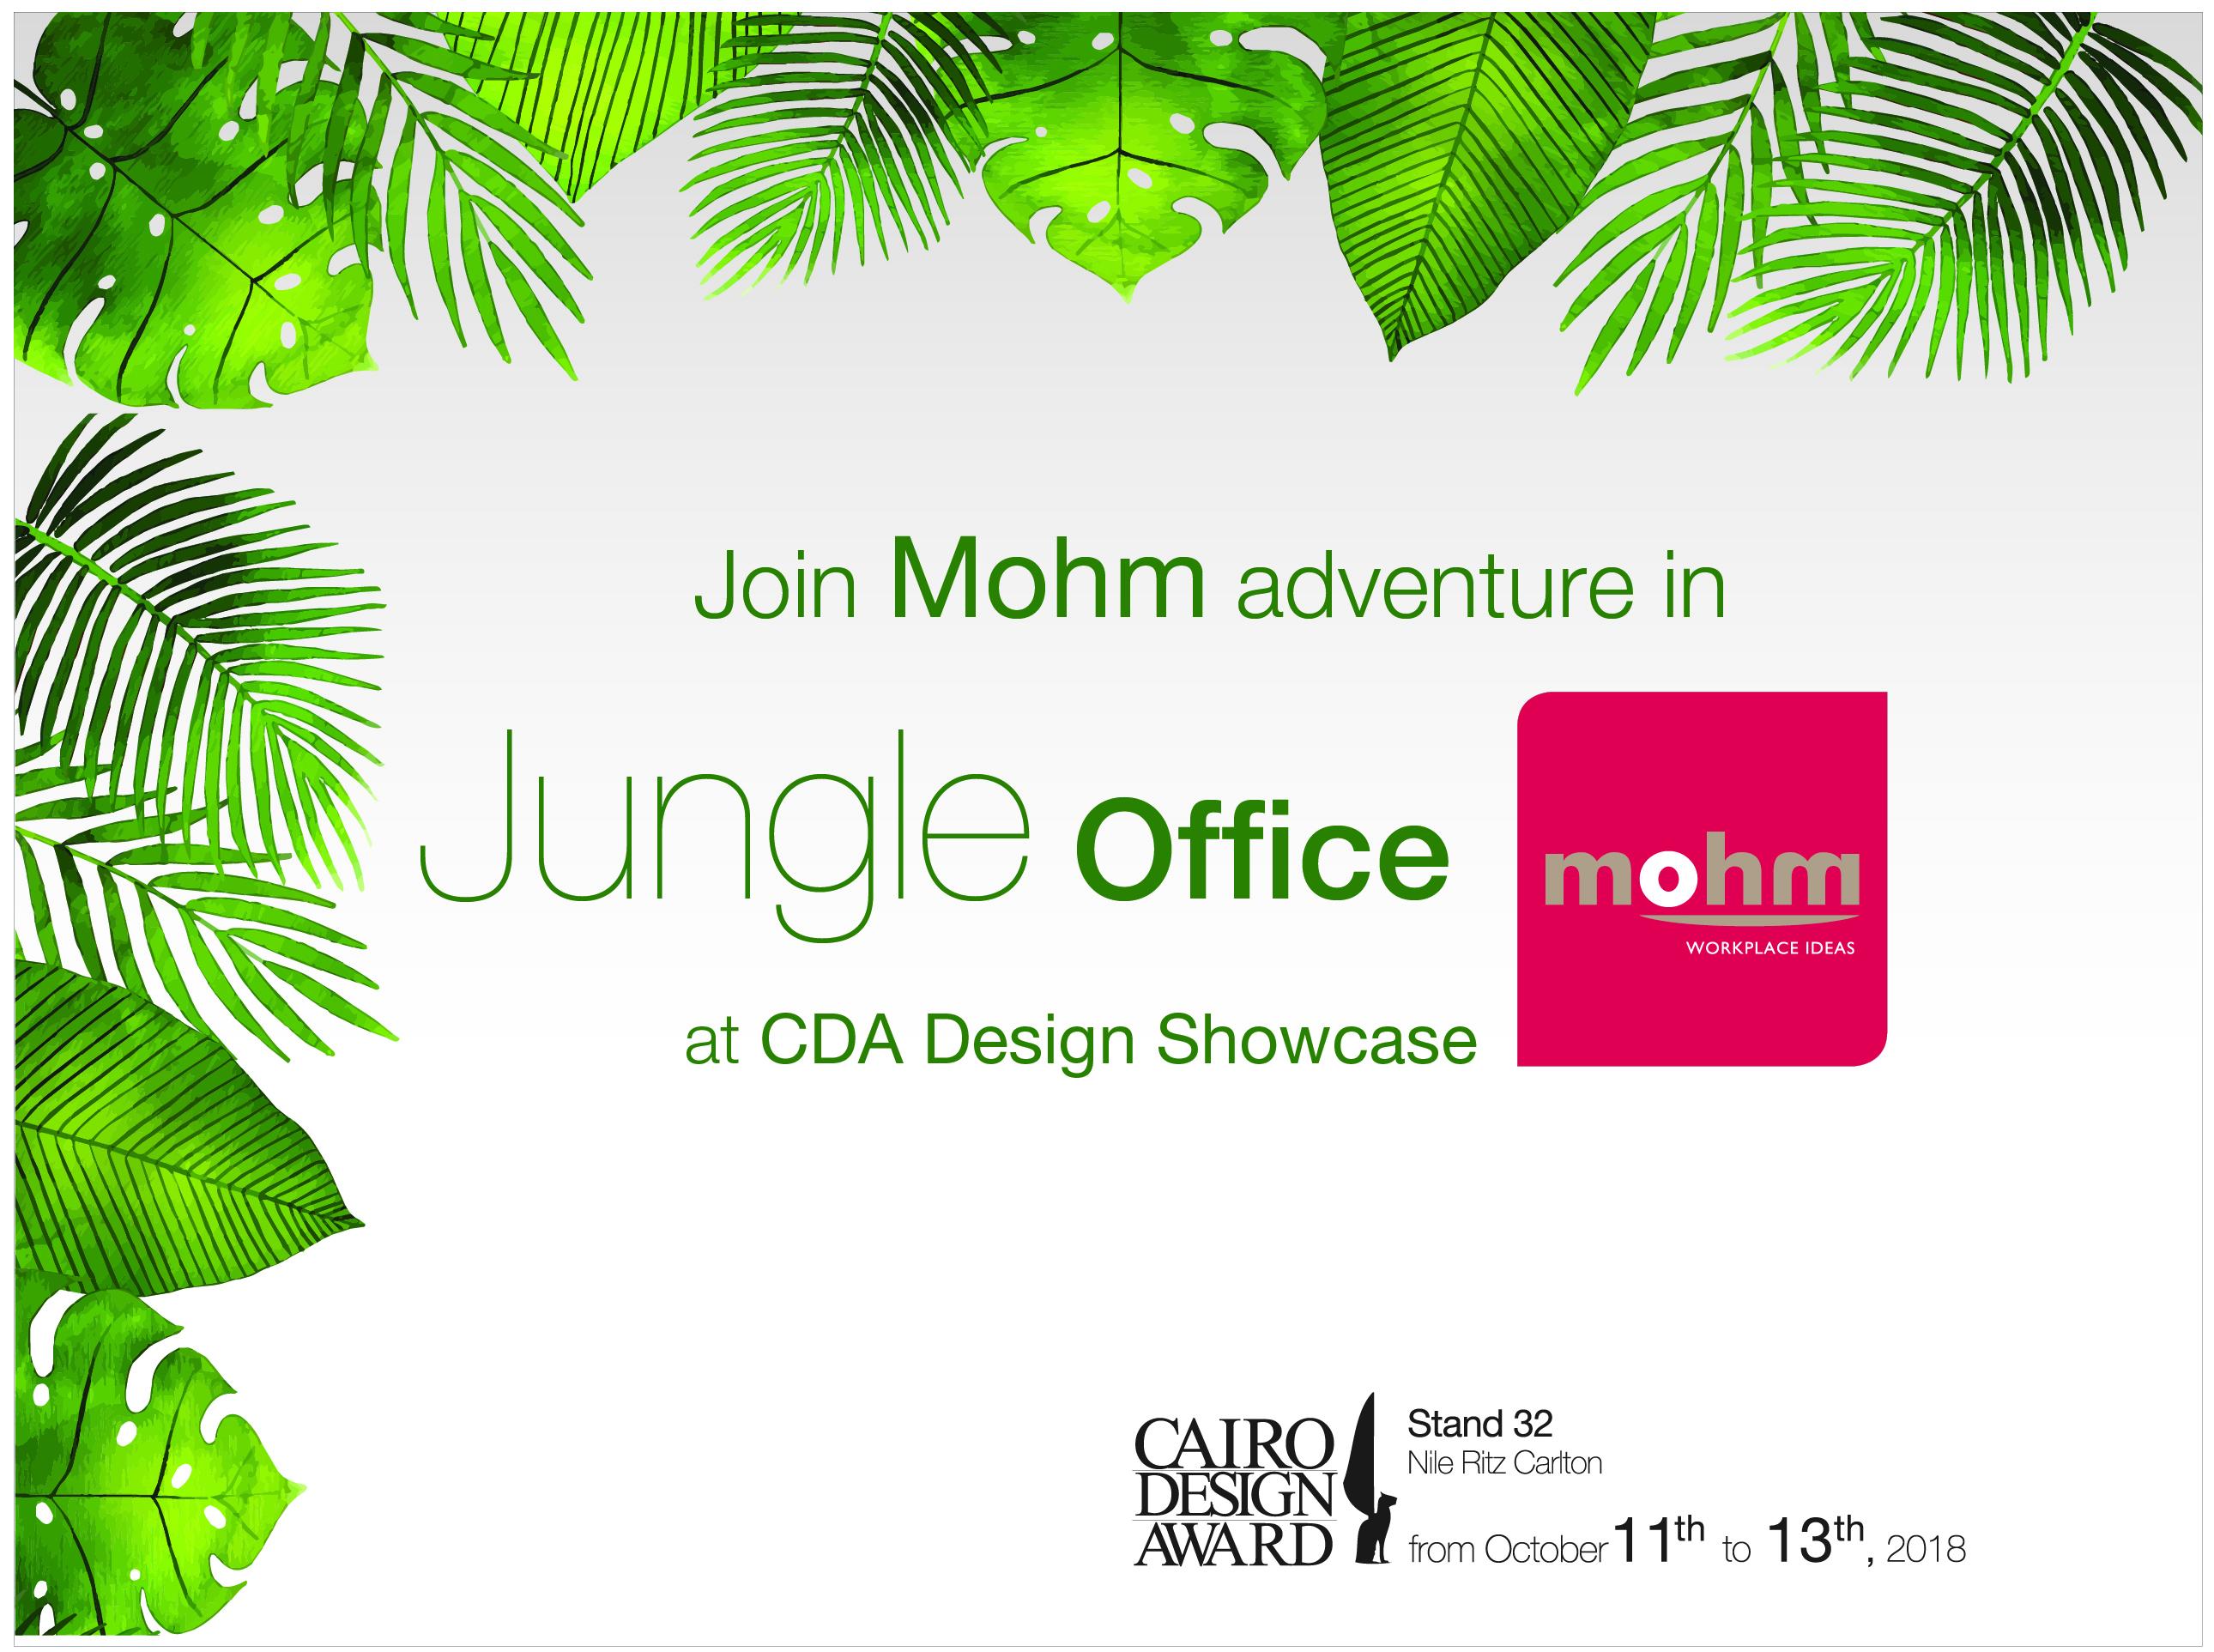 Cairo Design Award 2018 Mohm